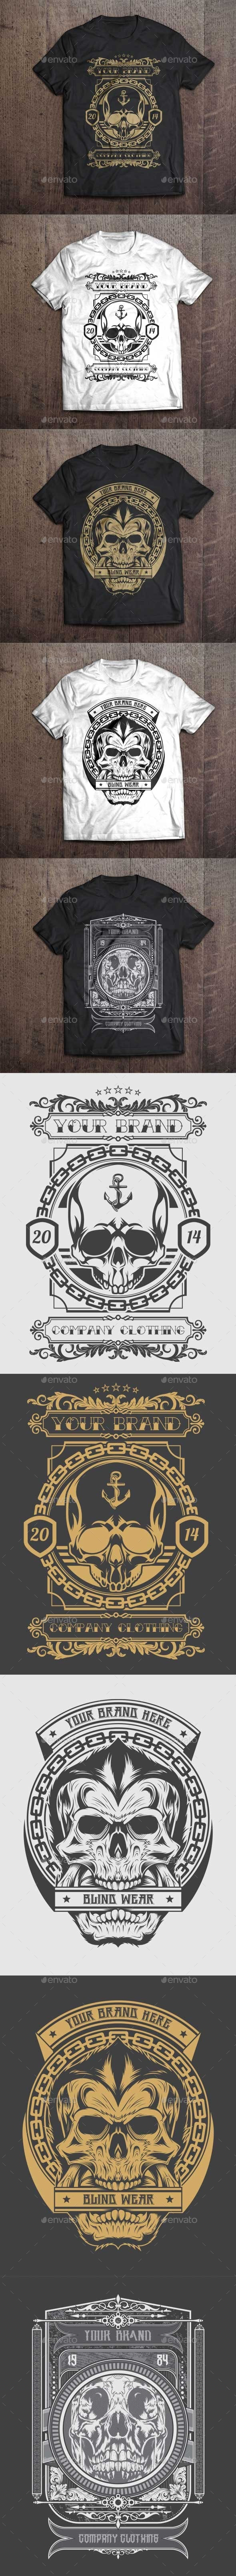 3 T-Shirt Illustration - Skull Theme - Designs T-Shirts